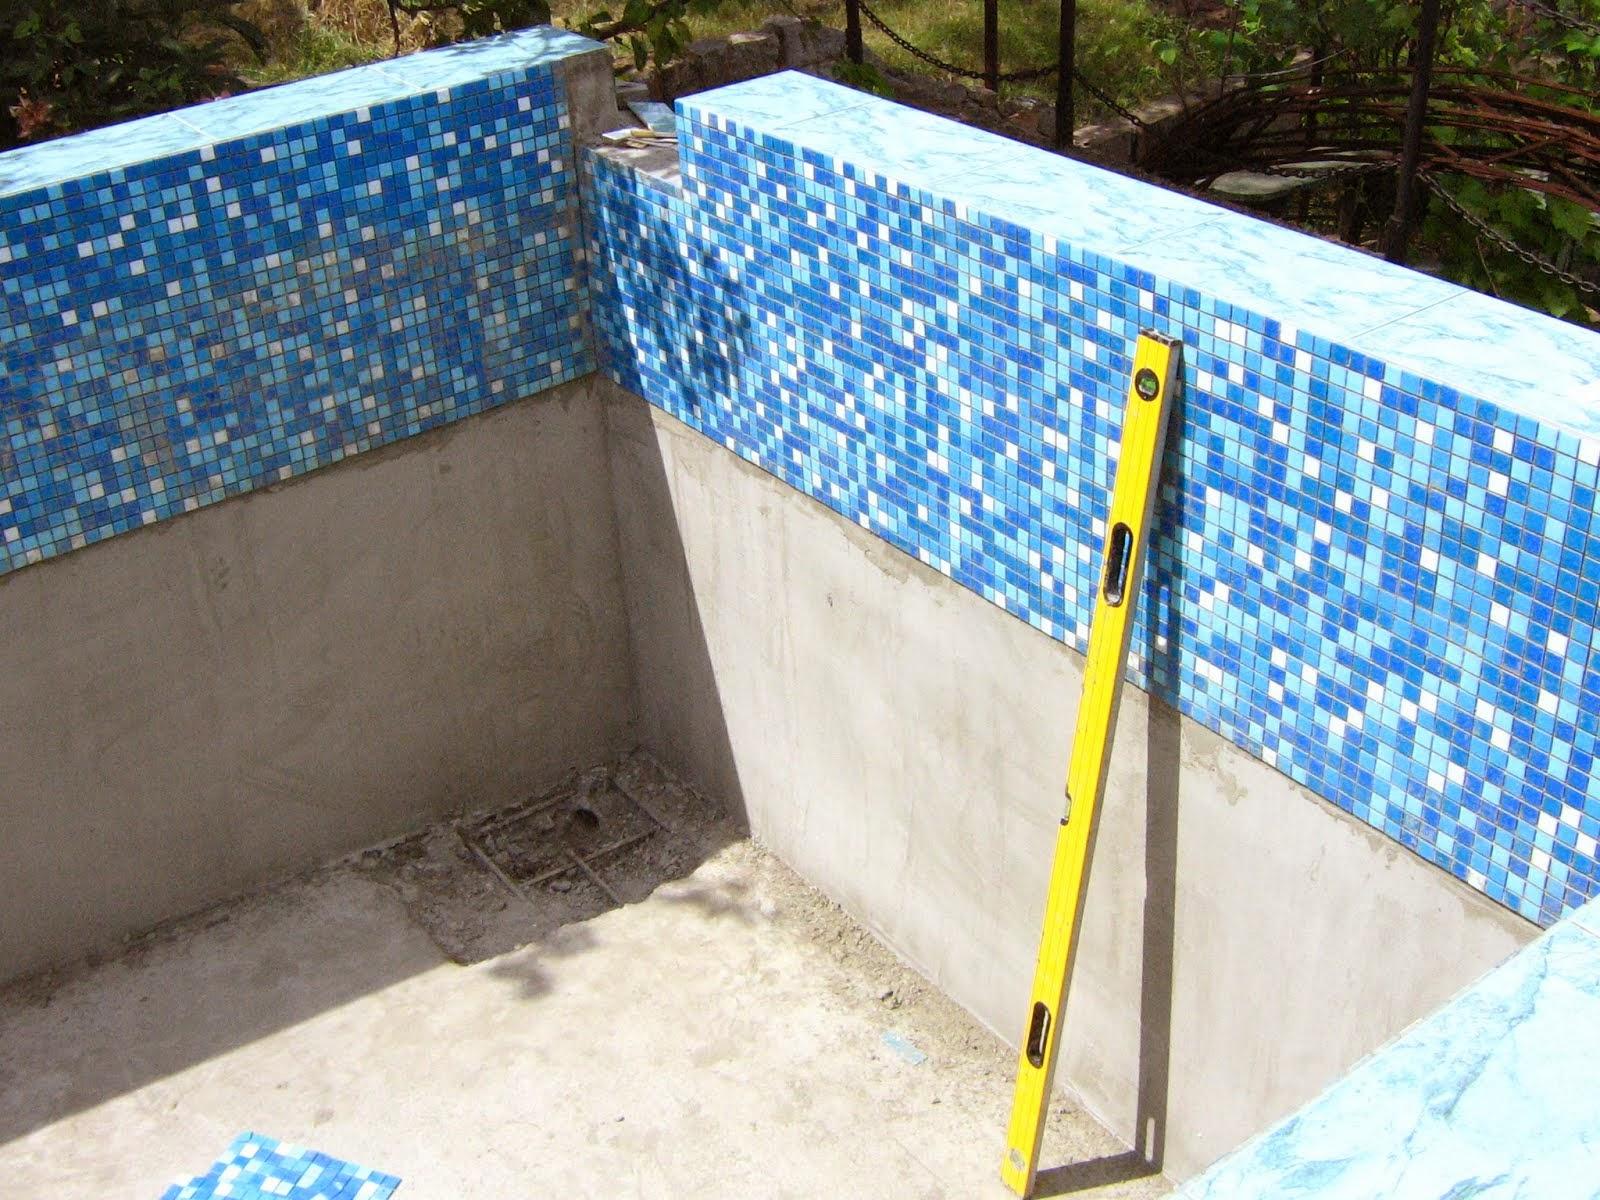 Укладка мозаики в бассейн